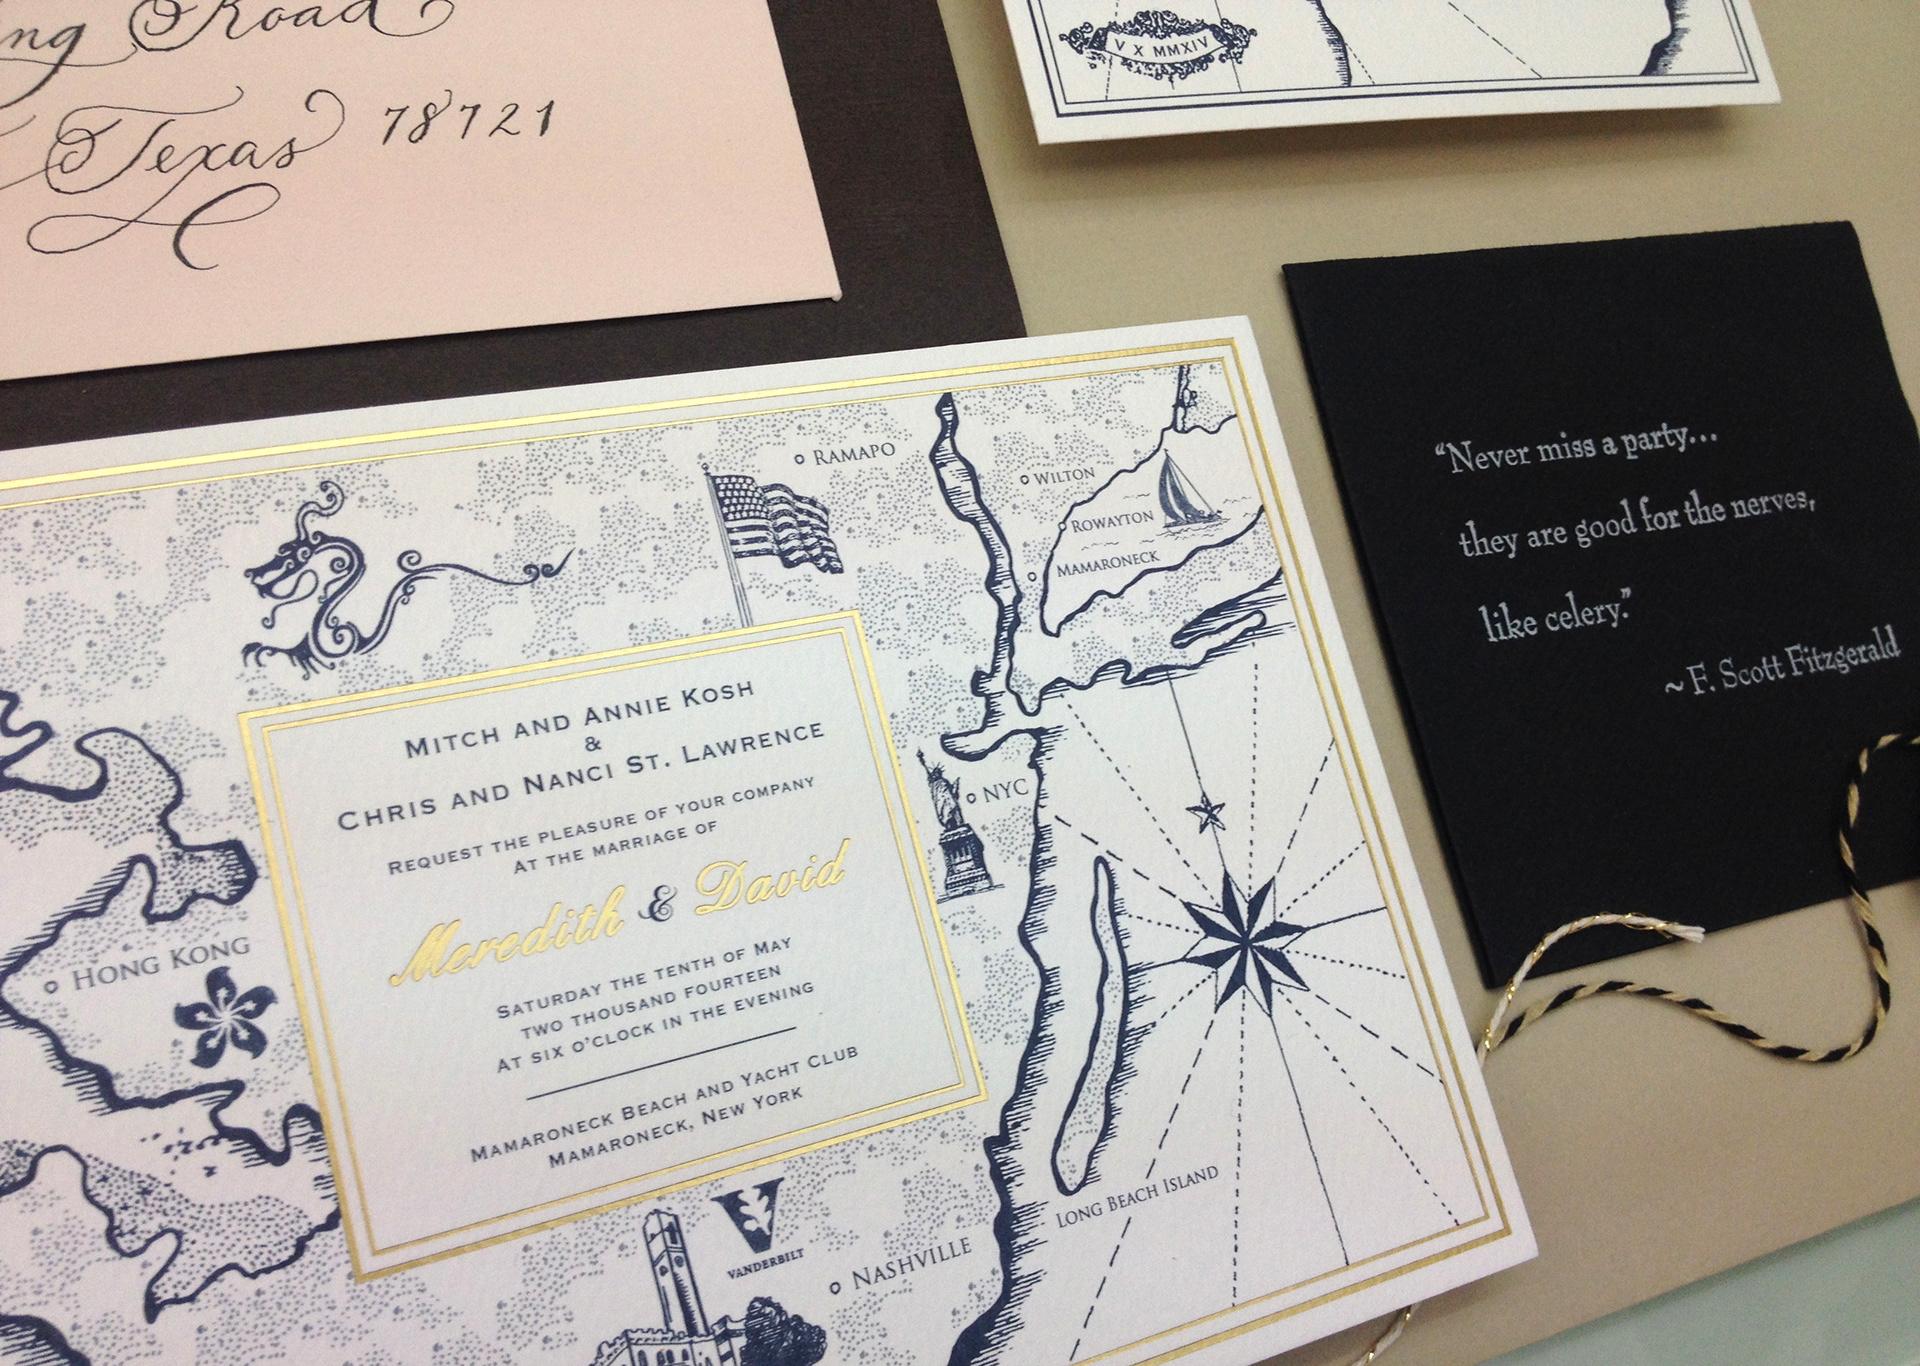 Ka Lo Chu - Vintage New York Bespoke Wedding Invitation Design